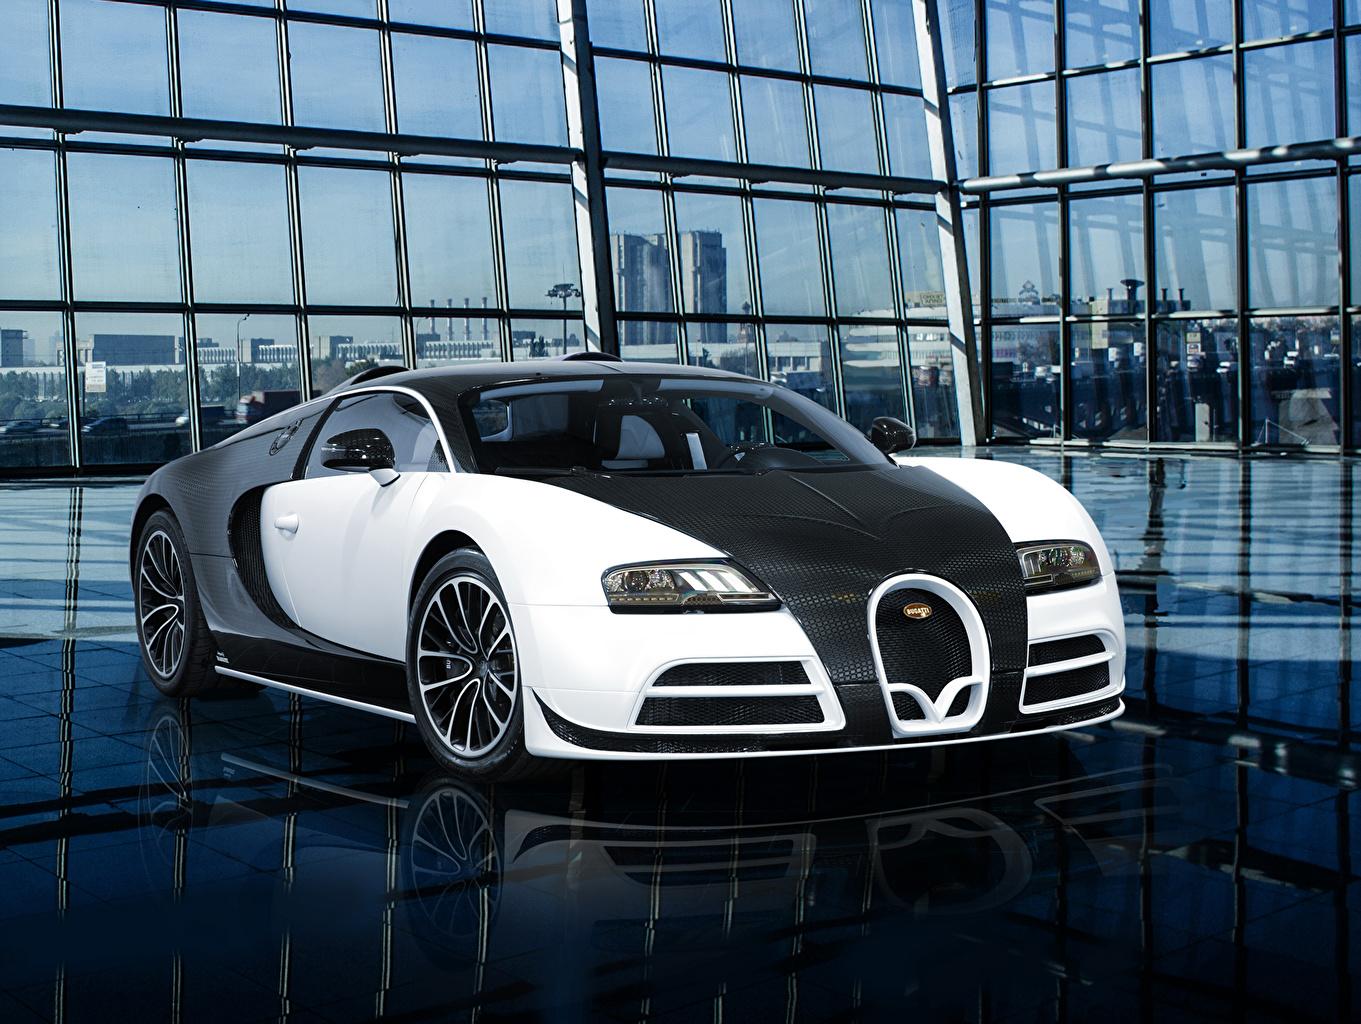 Photo Tuning BUGATTI 2014 Veyron 16.4 Vivere (Mansory) luxurious auto Front Luxury expensive Cars automobile